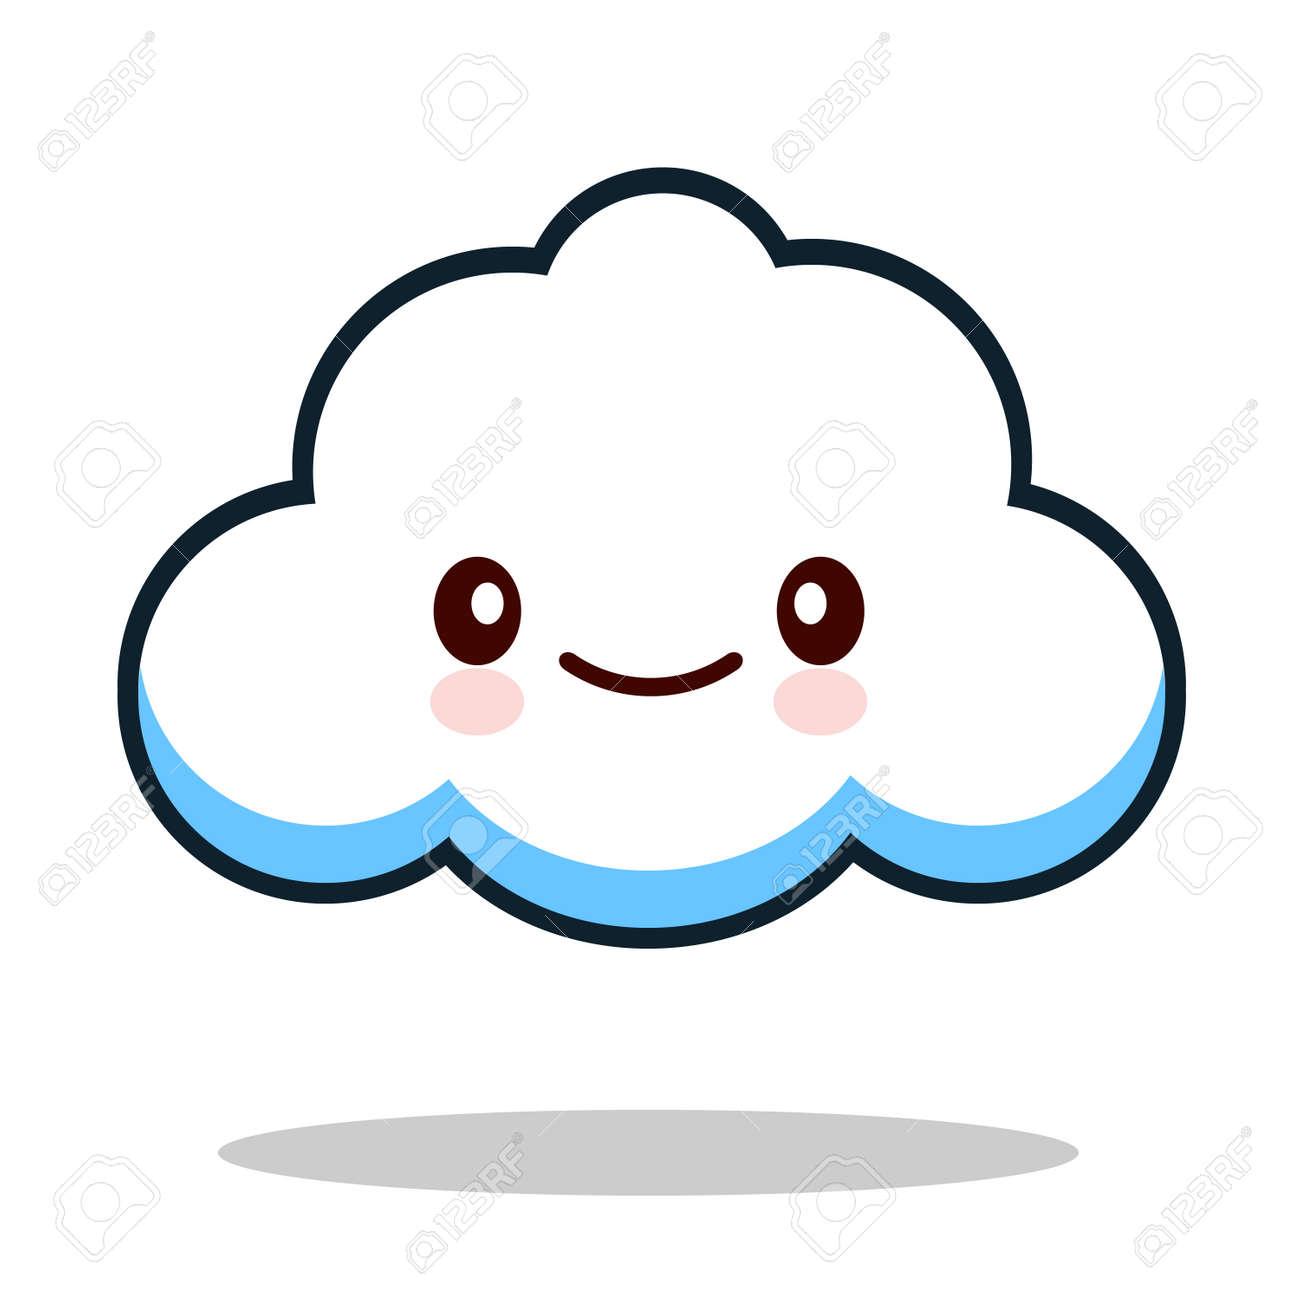 kawaii cartoon white emoticon cute cloud illustration stock photo